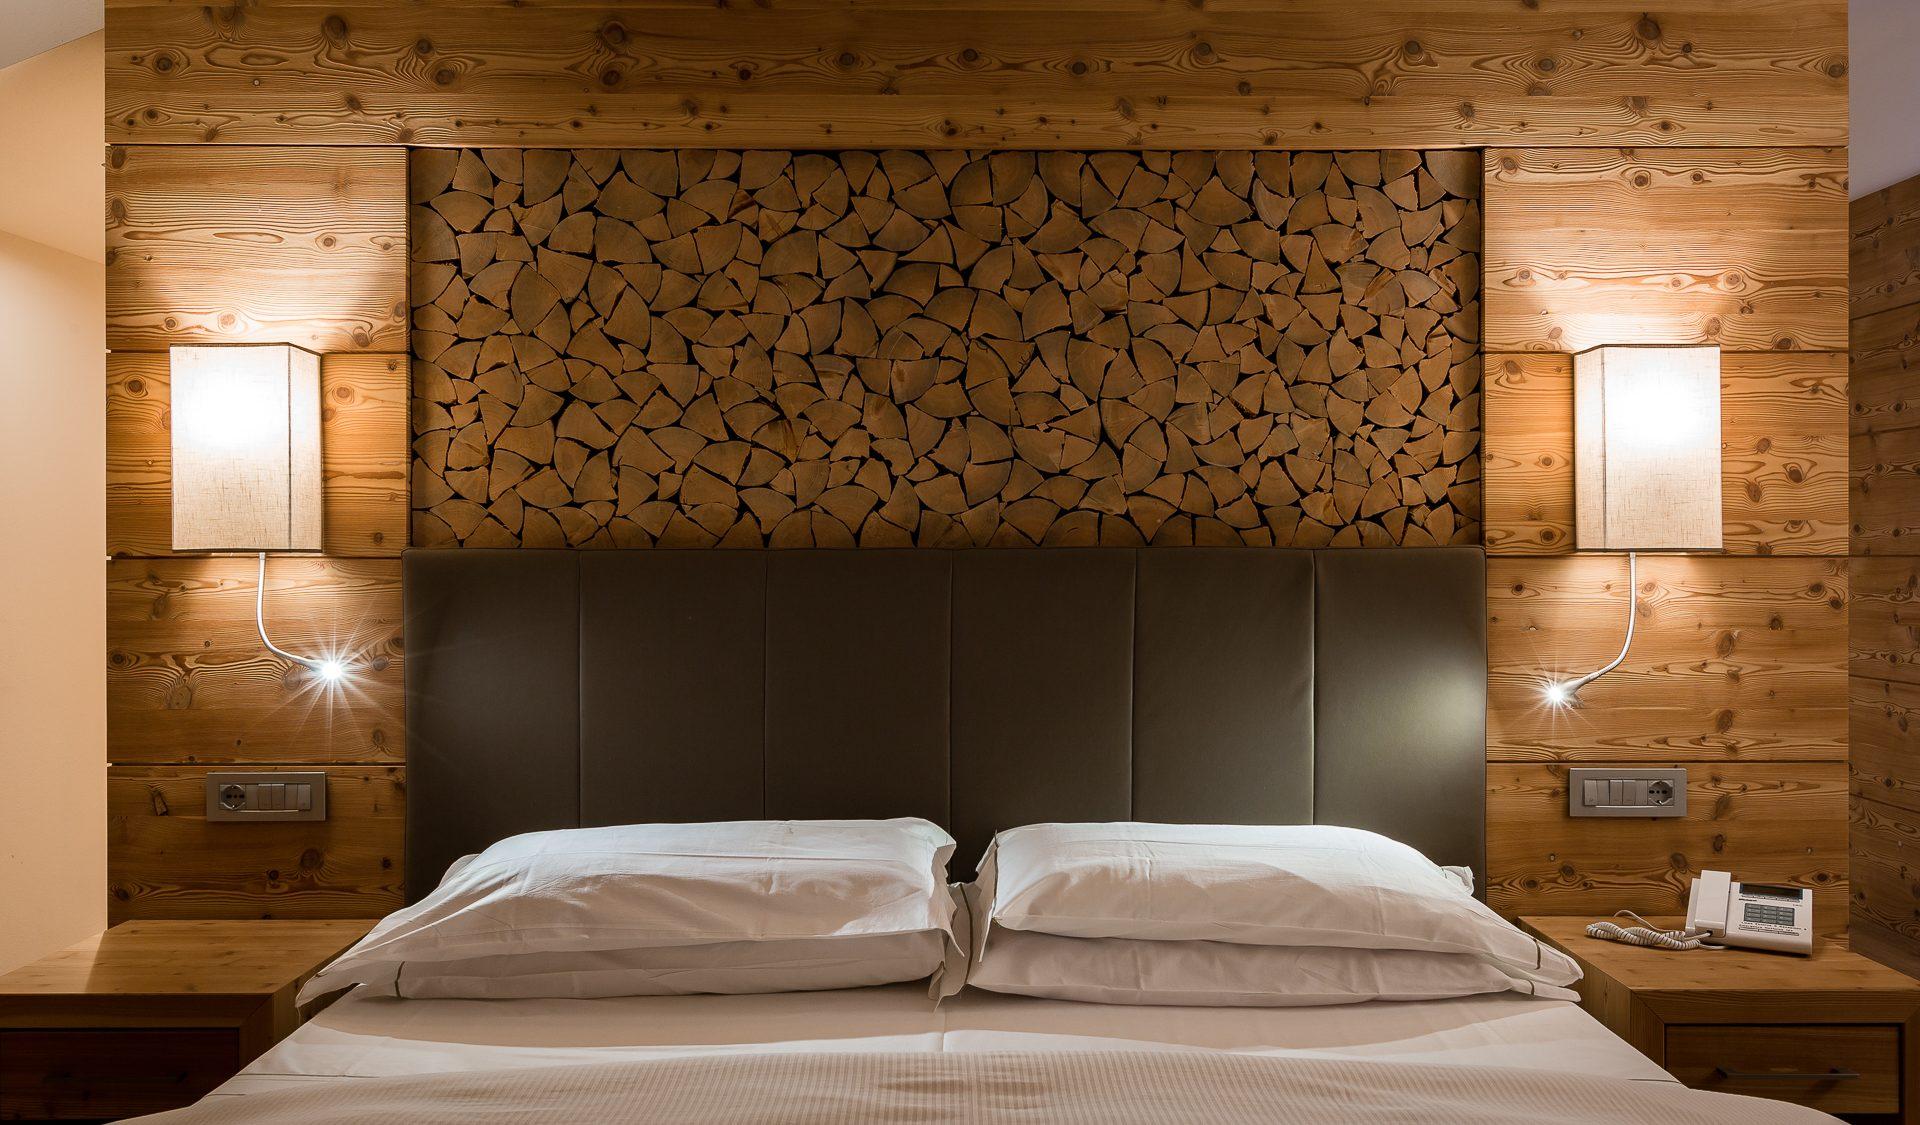 Hotel Europeo Pinzolo, camera doppia